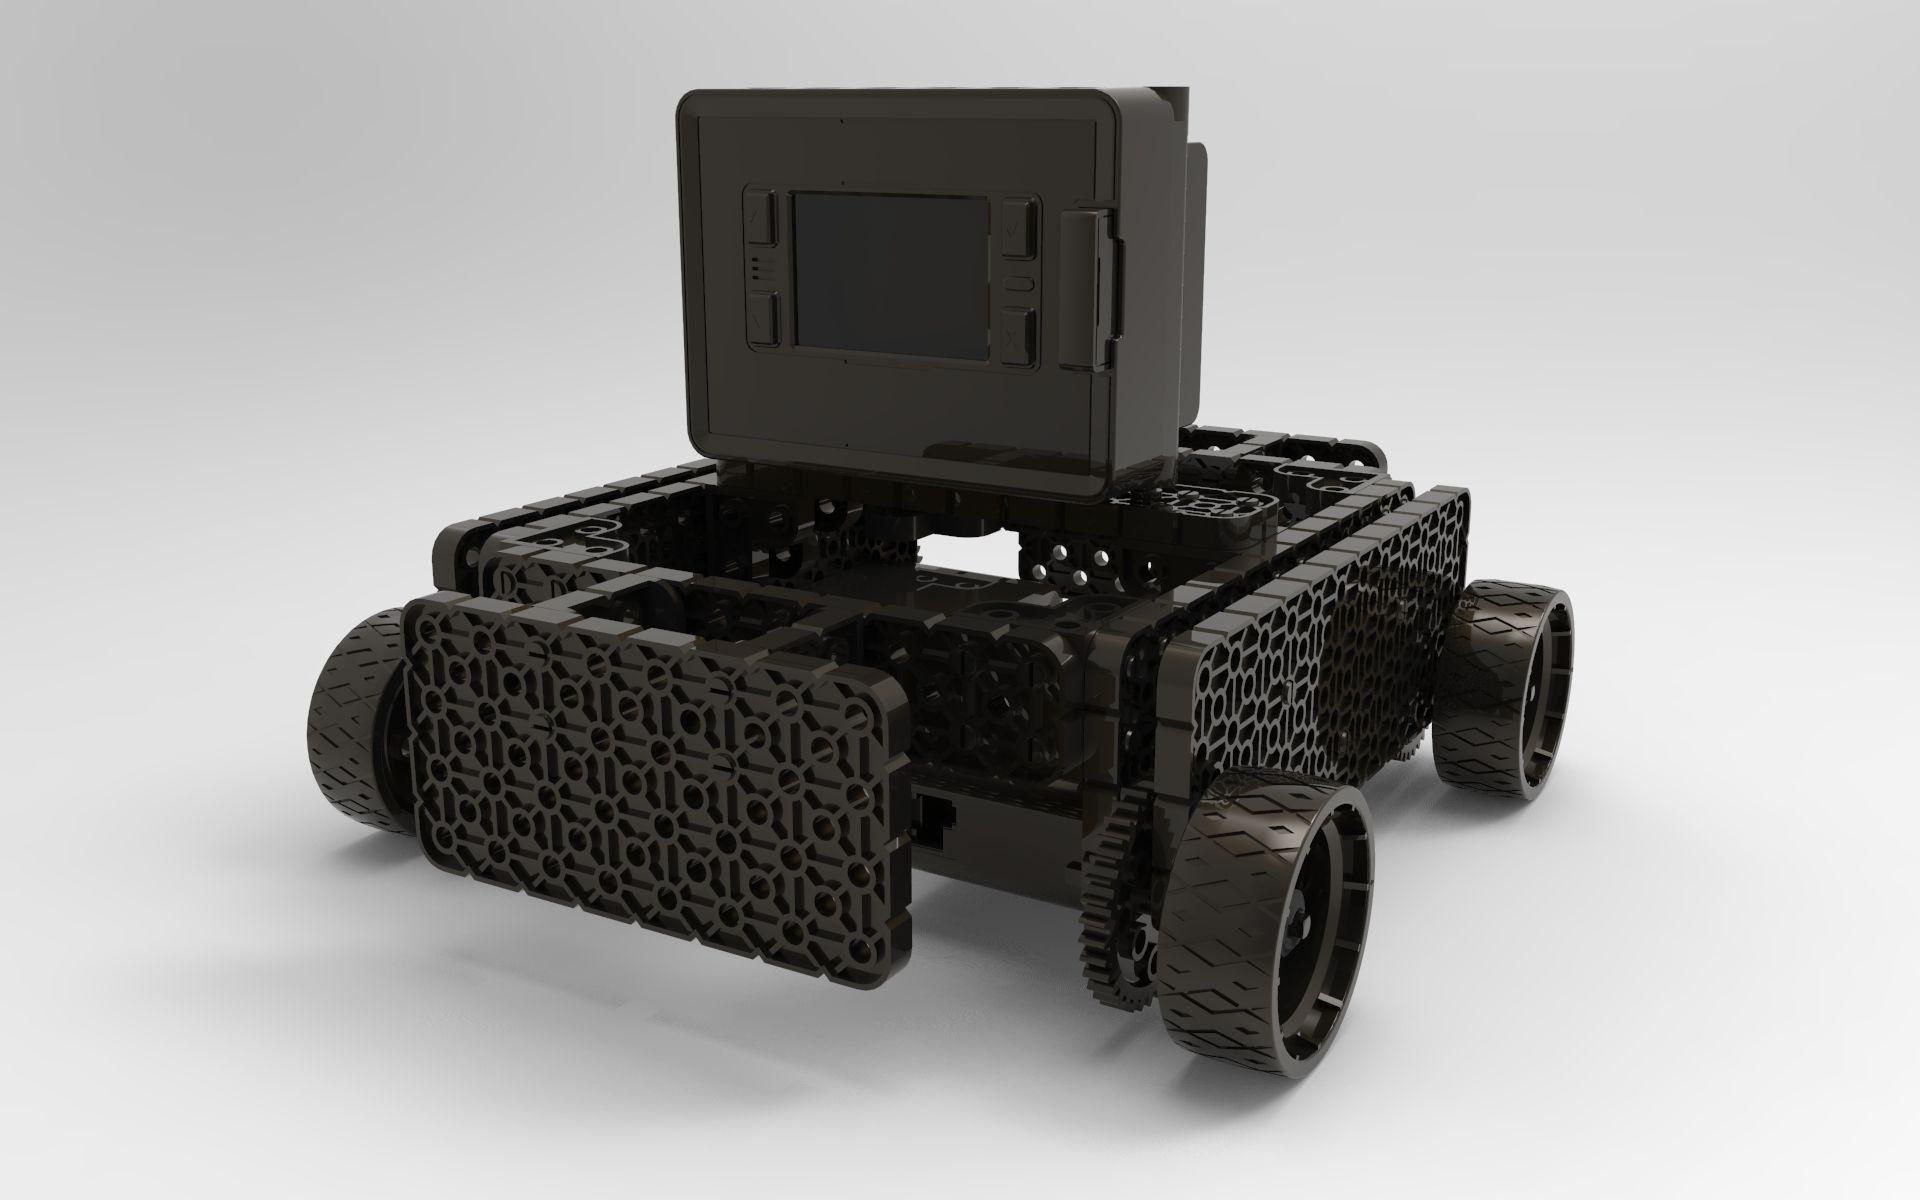 Robot-vexx-3500-3500